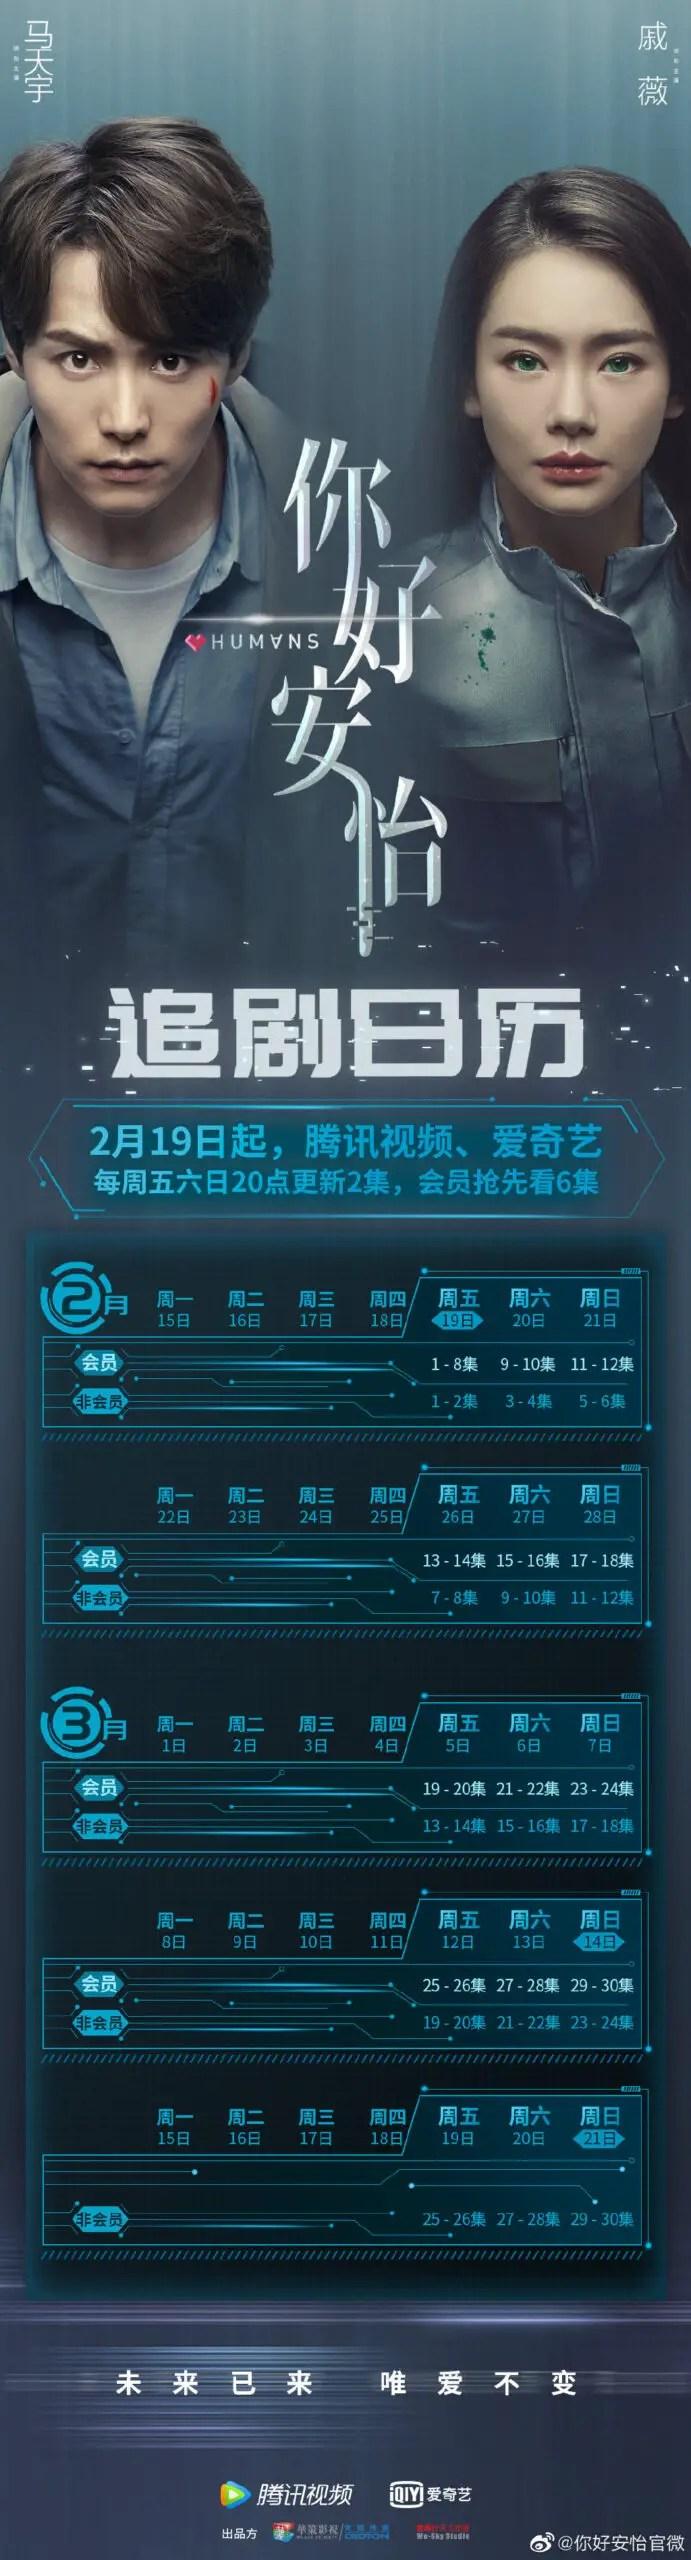 Humans Chinese Drama Airing Calendar